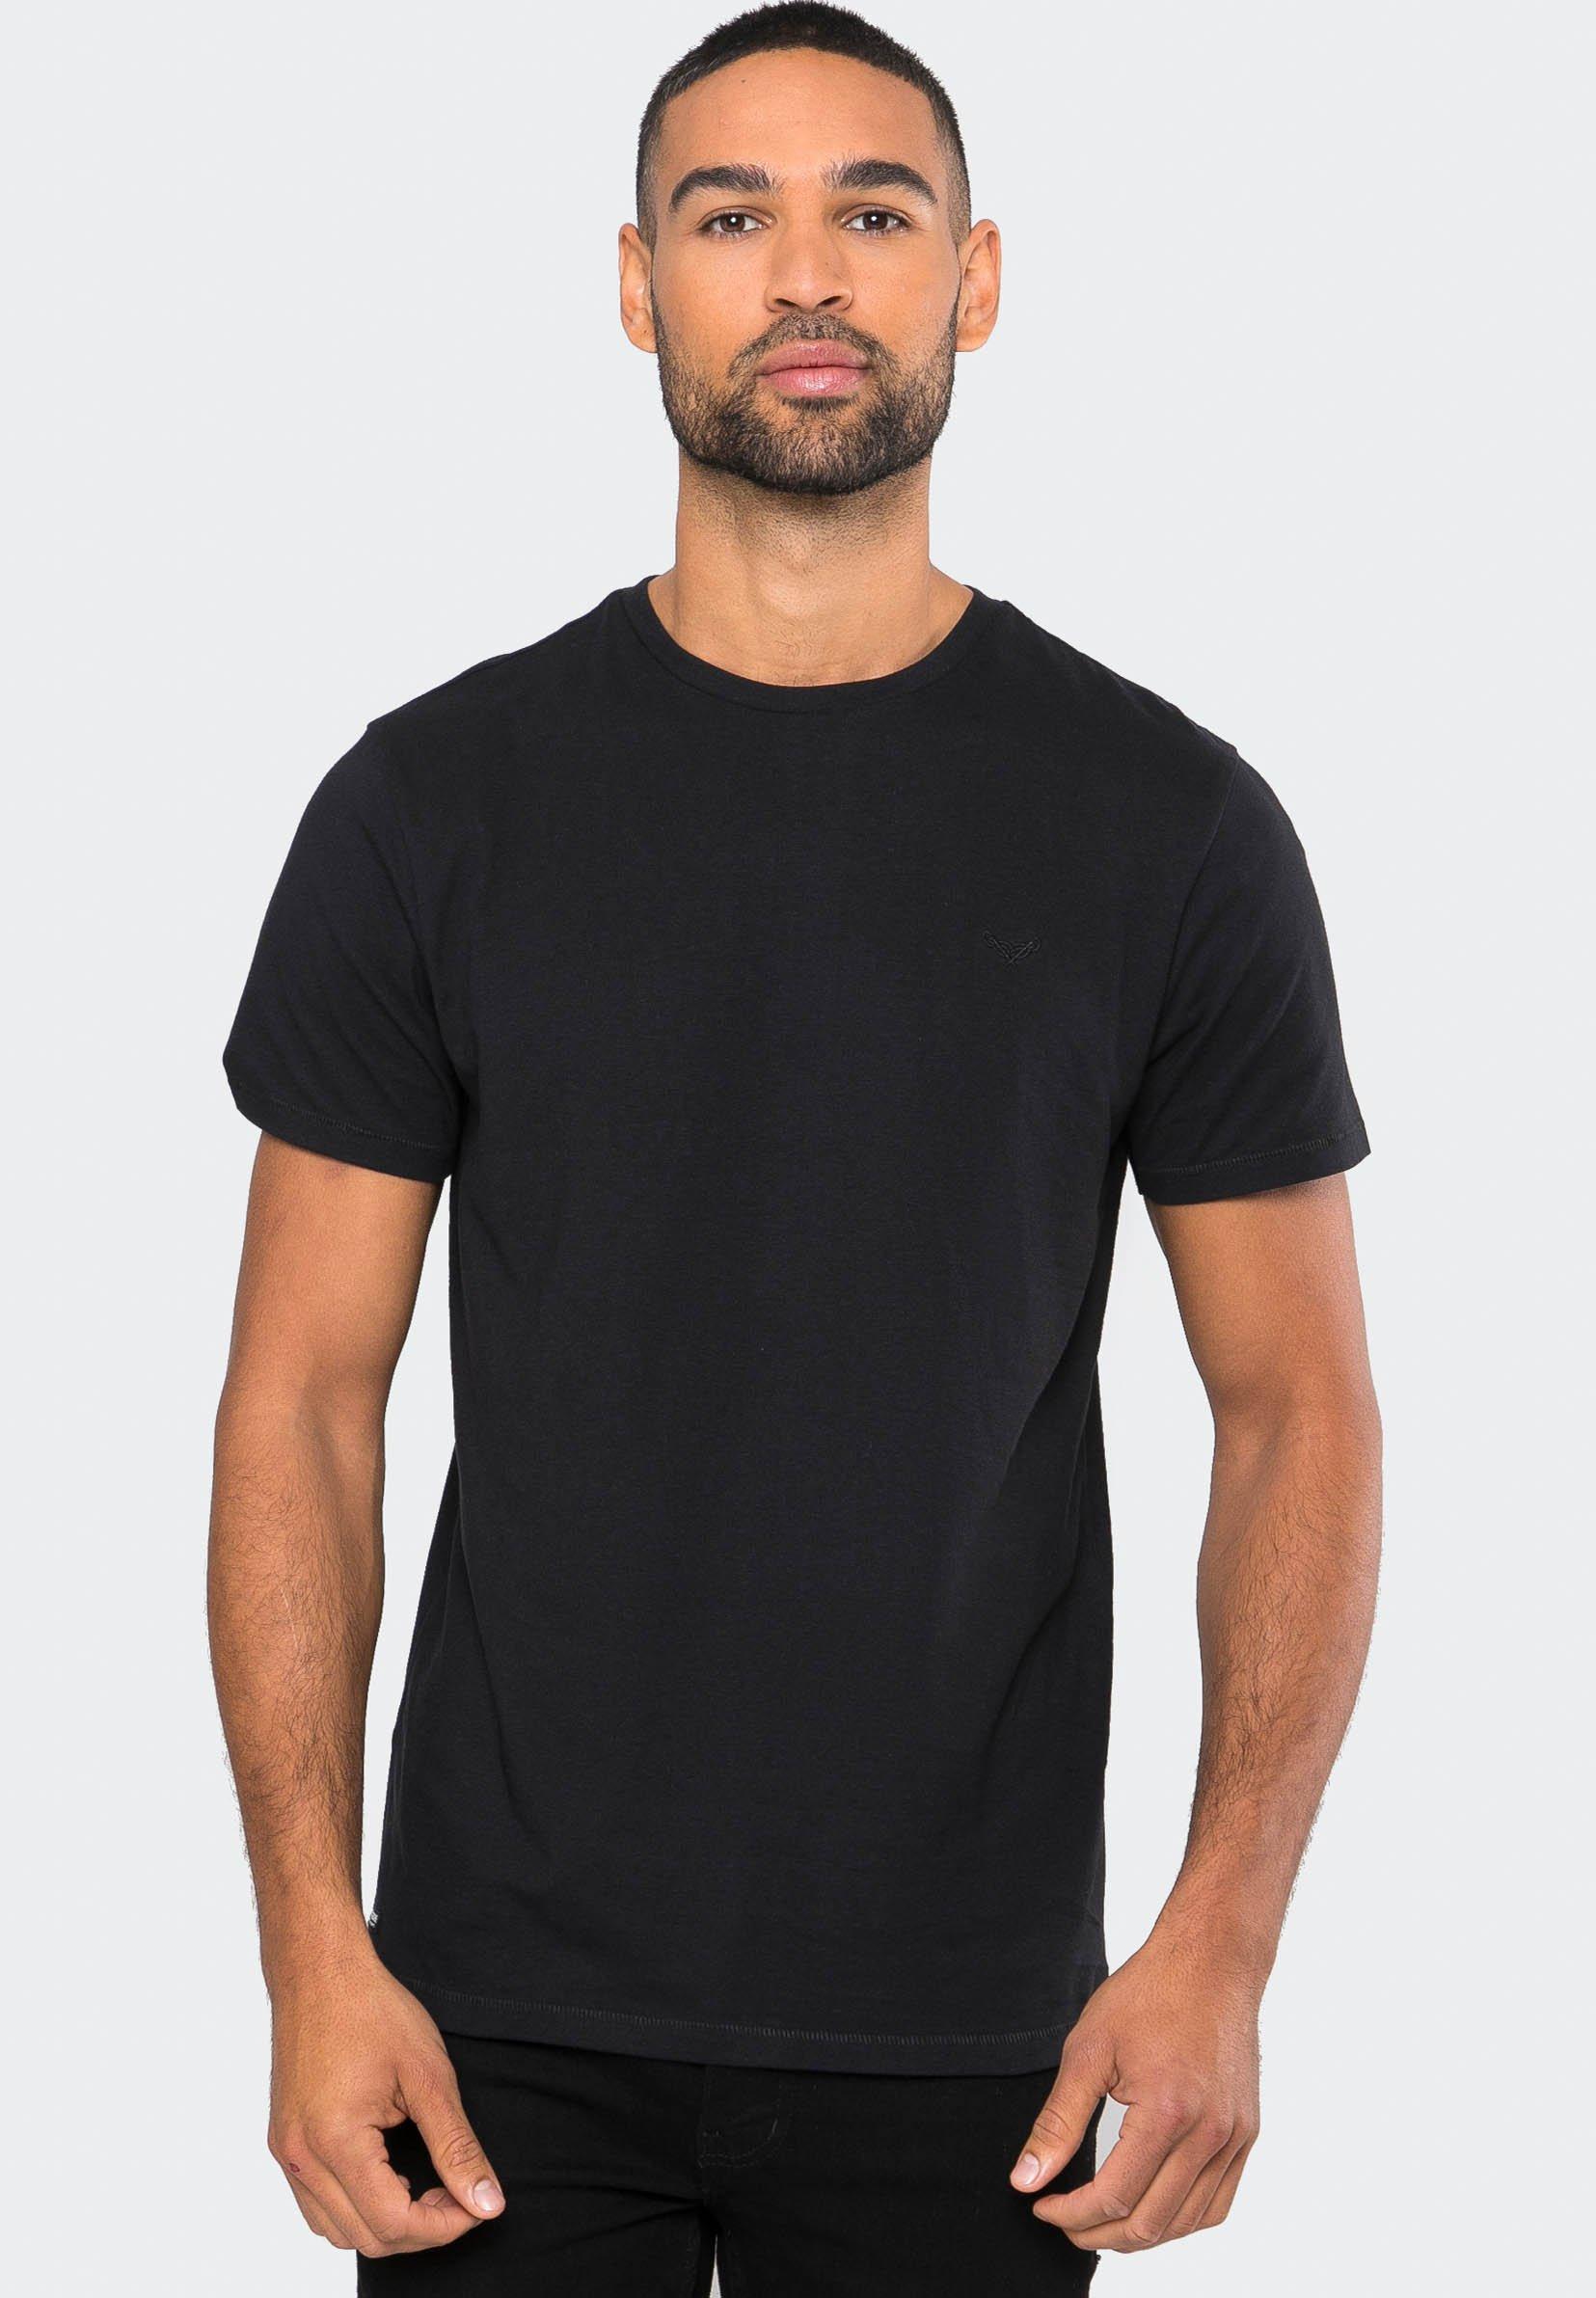 Uomo THREADBARE T-SHIRT BASIC 5ER PACK - T-shirt basic